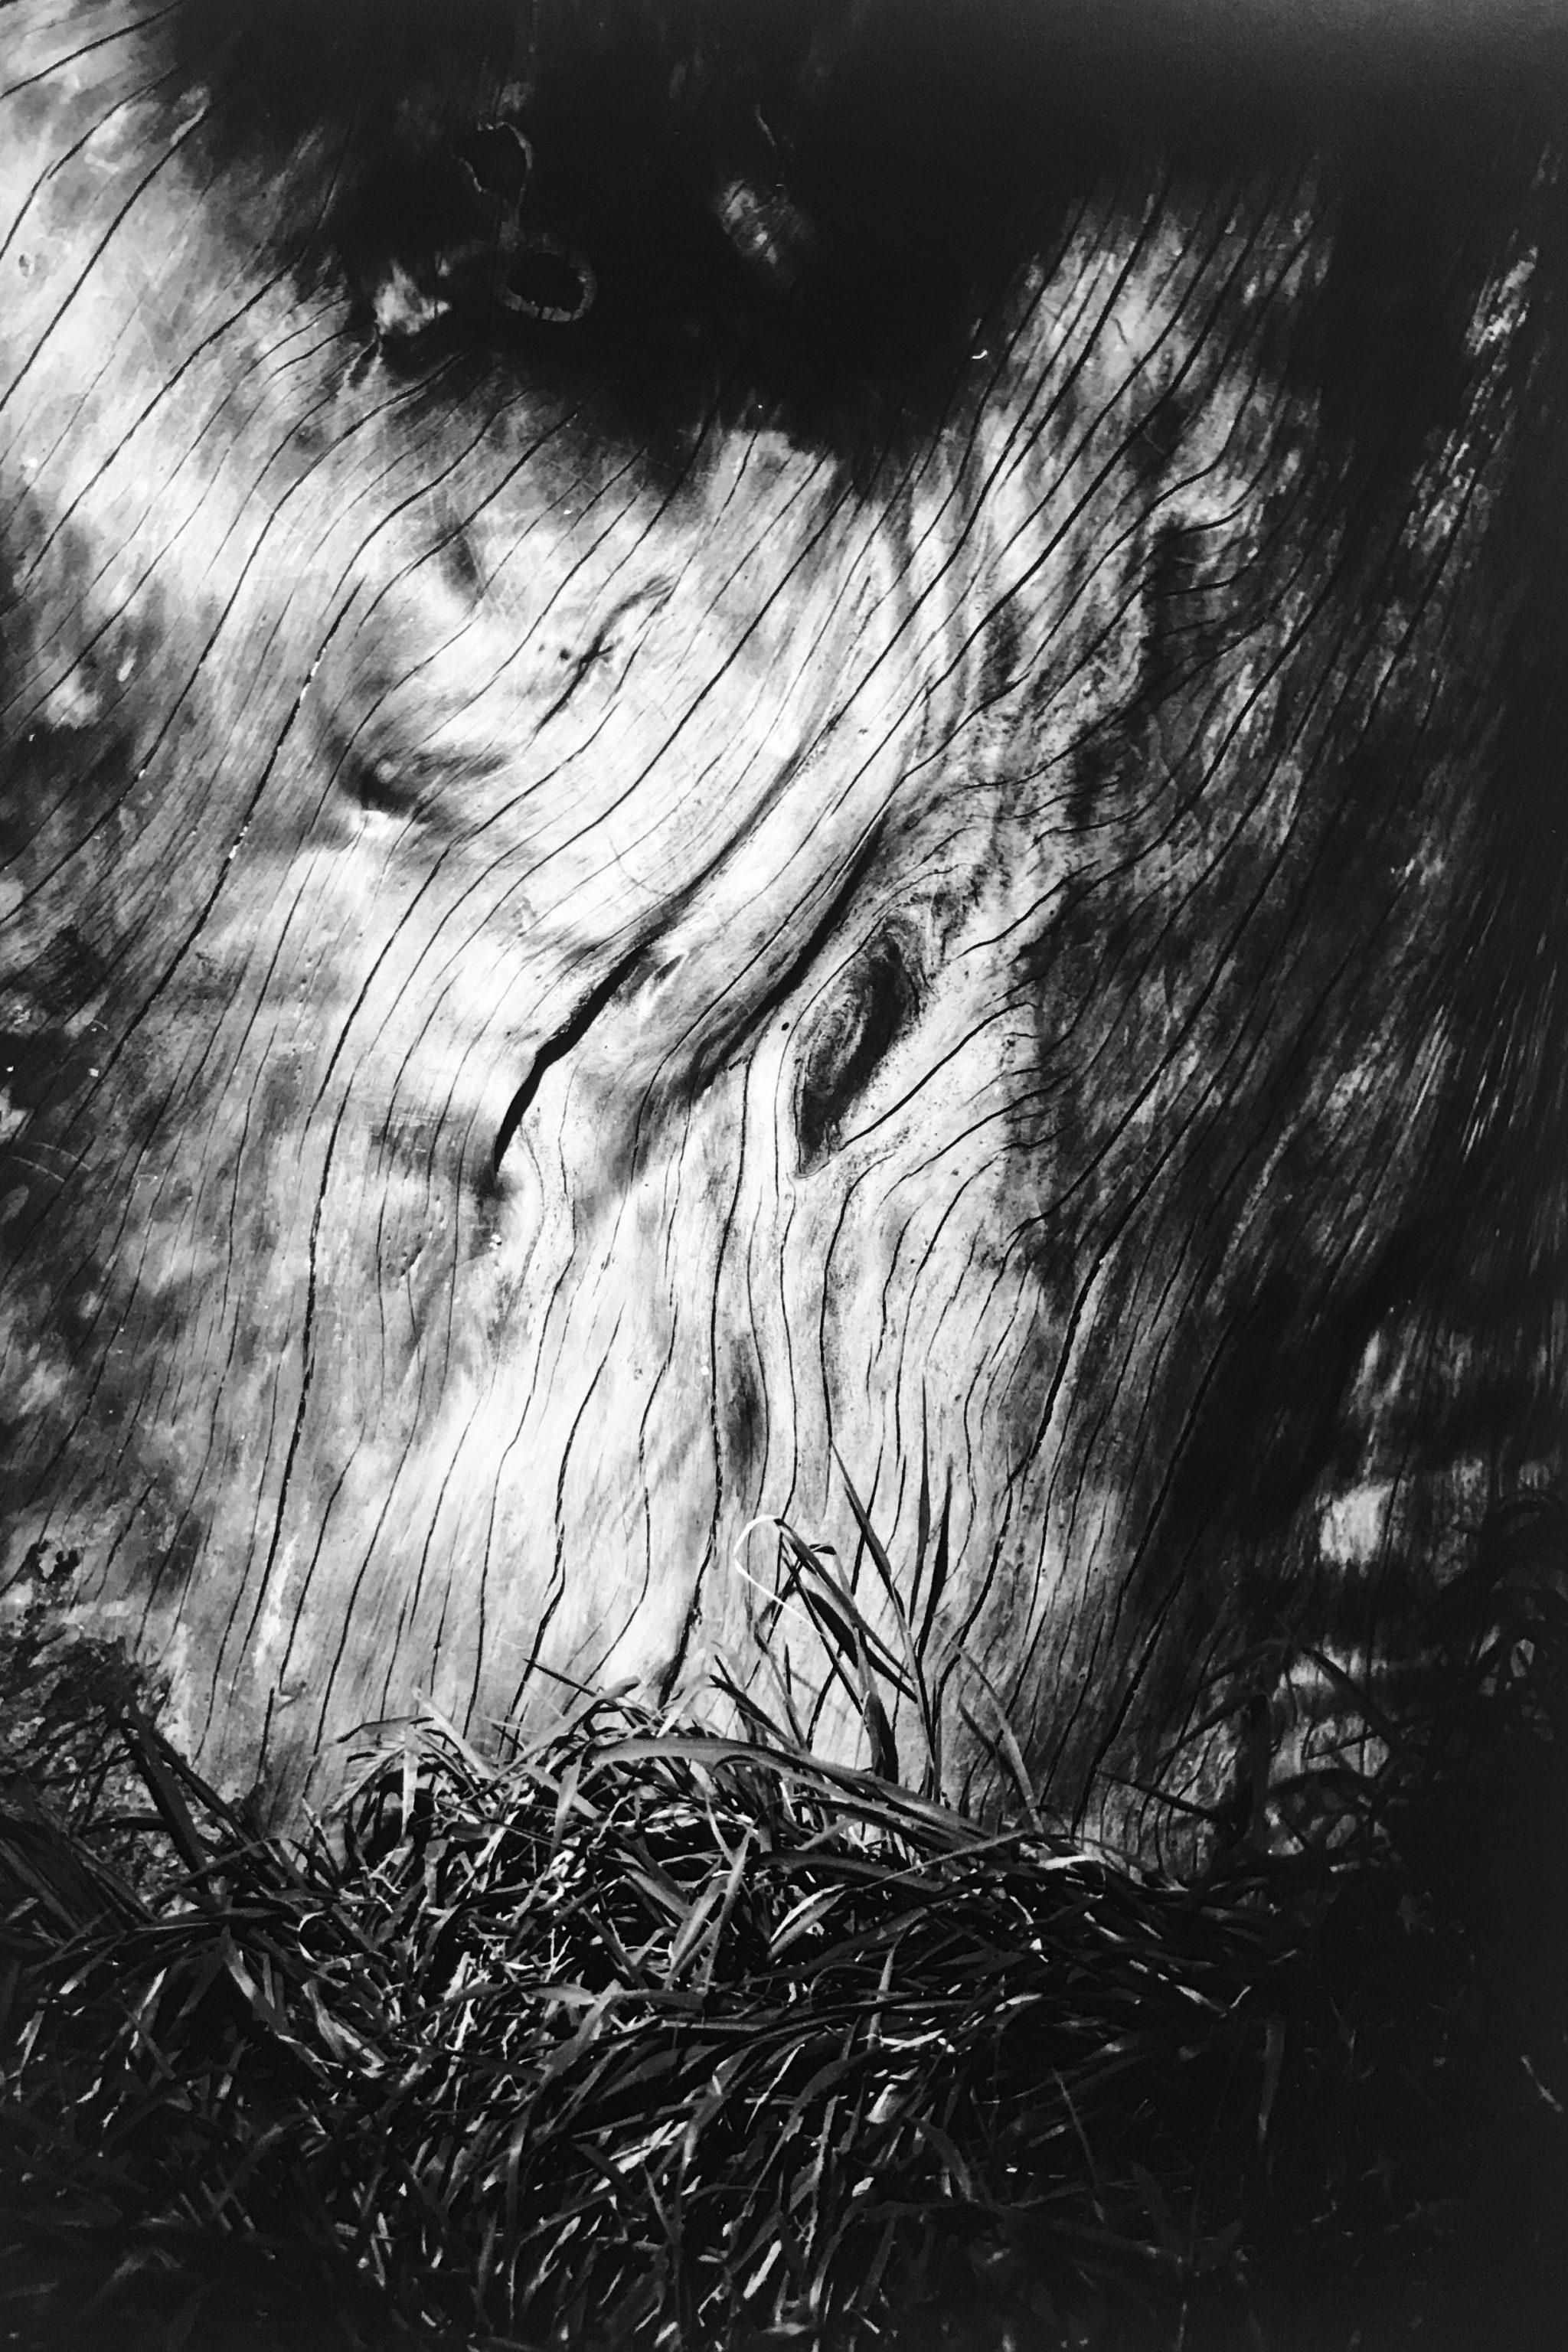 """Alberi""  Photographs by Marco Gualtieri"